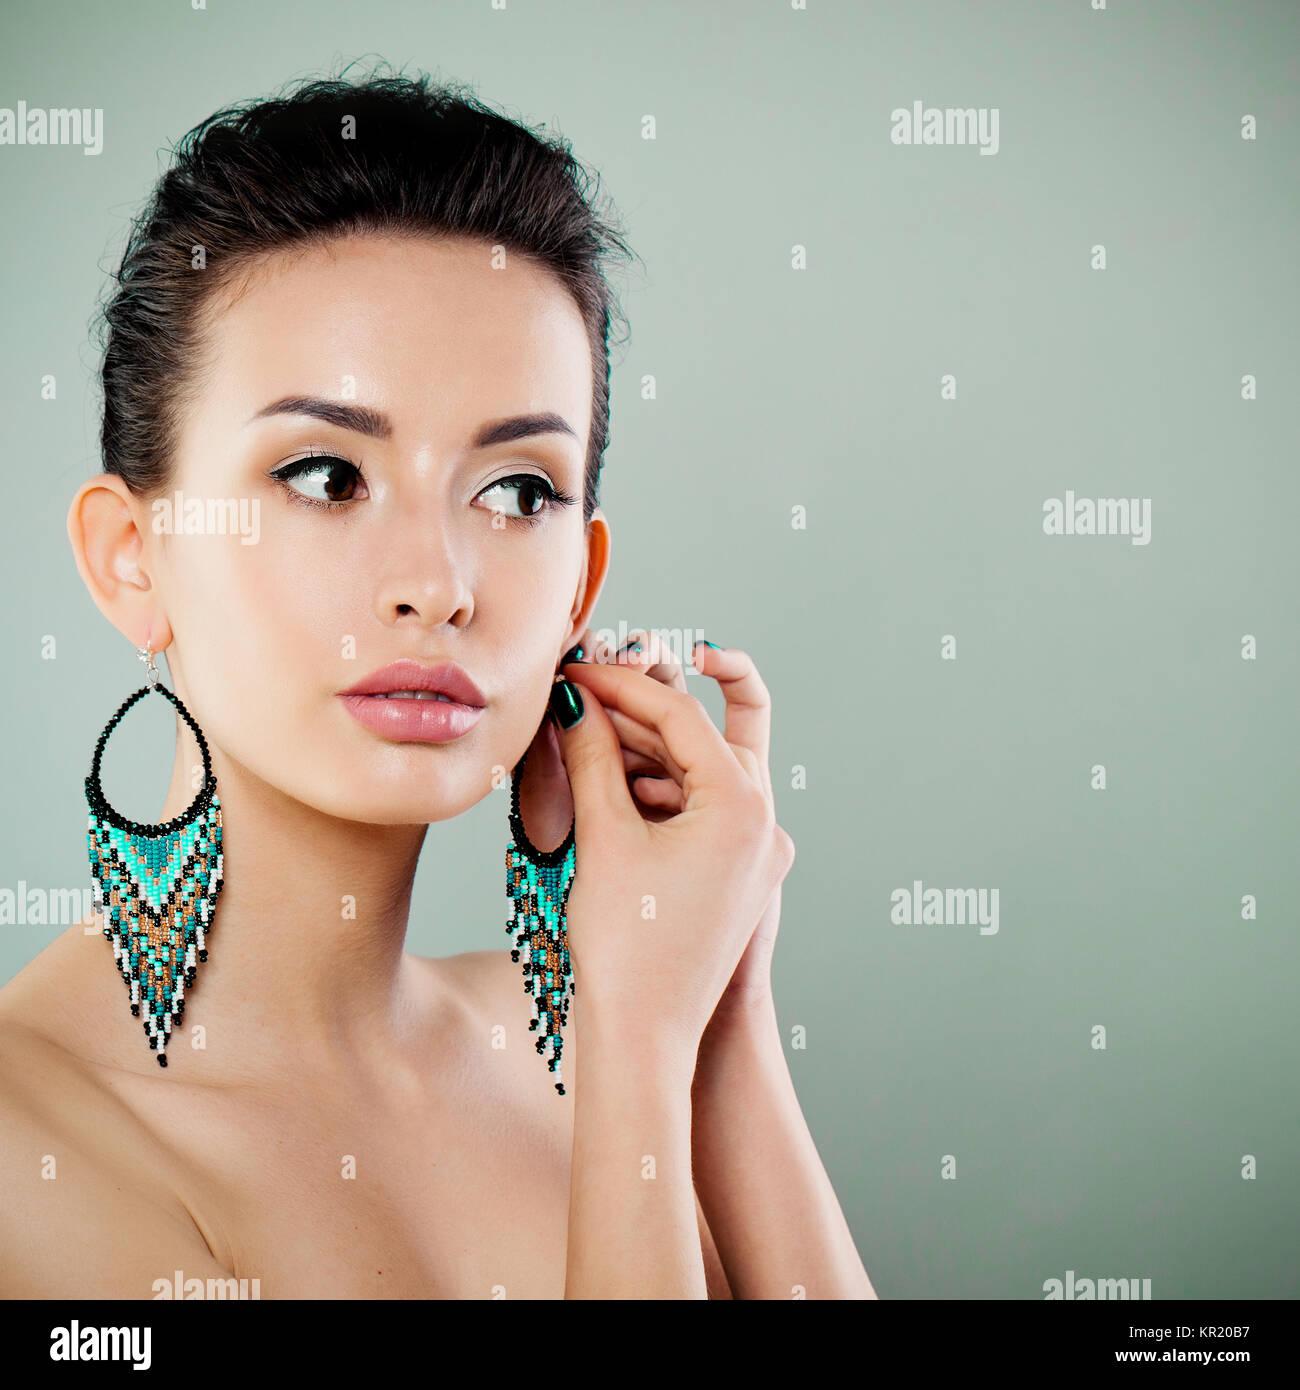 Beautiful Woman with Perfect Makeup Wearing Fashion Earrings Stock Photo